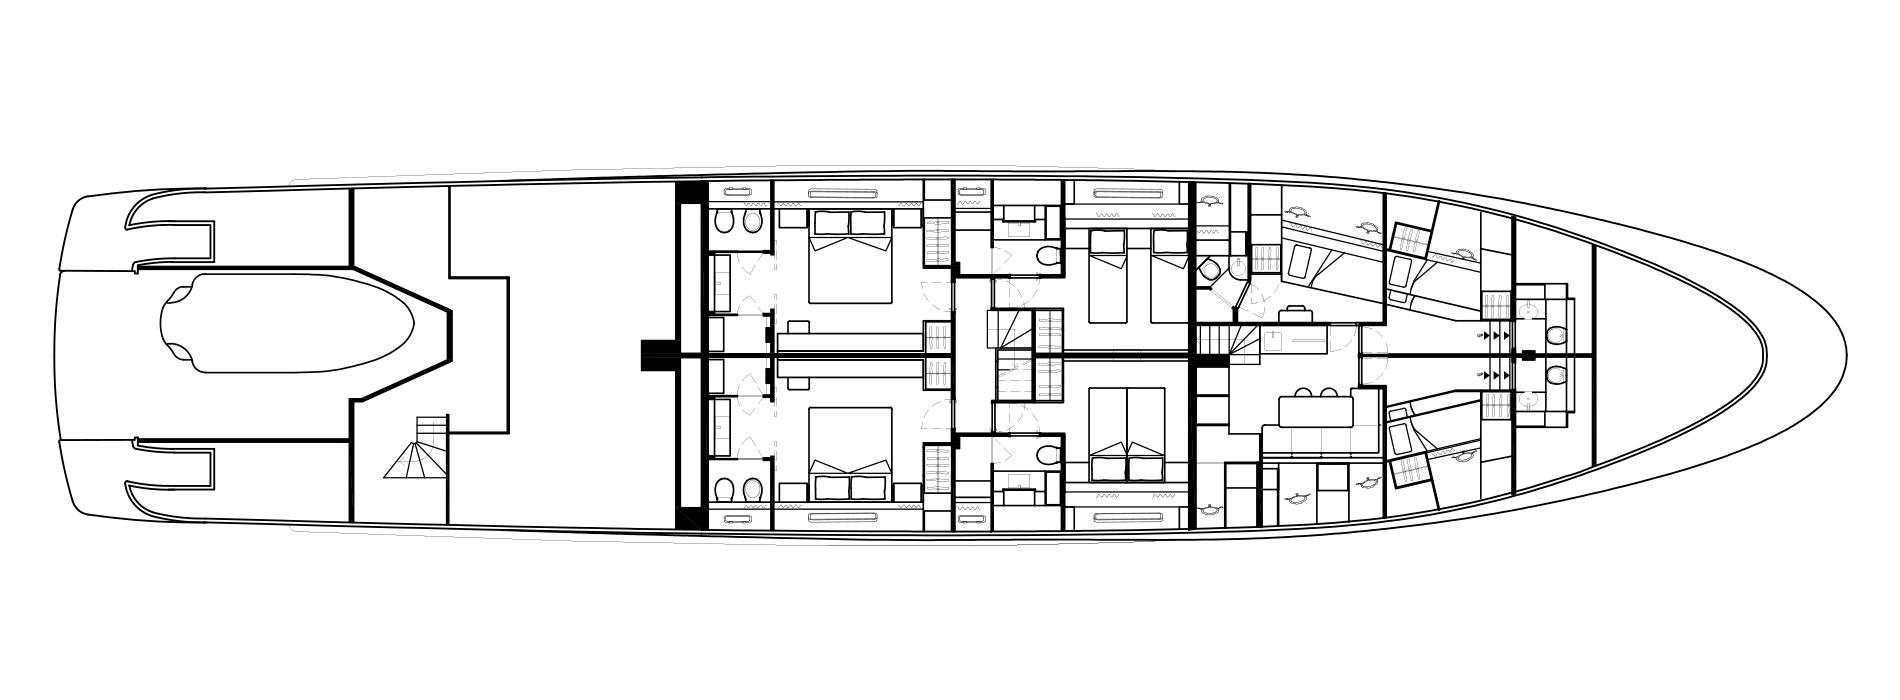 Sanlorenzo Yachts SD126 Pont inférieur Versione A bis